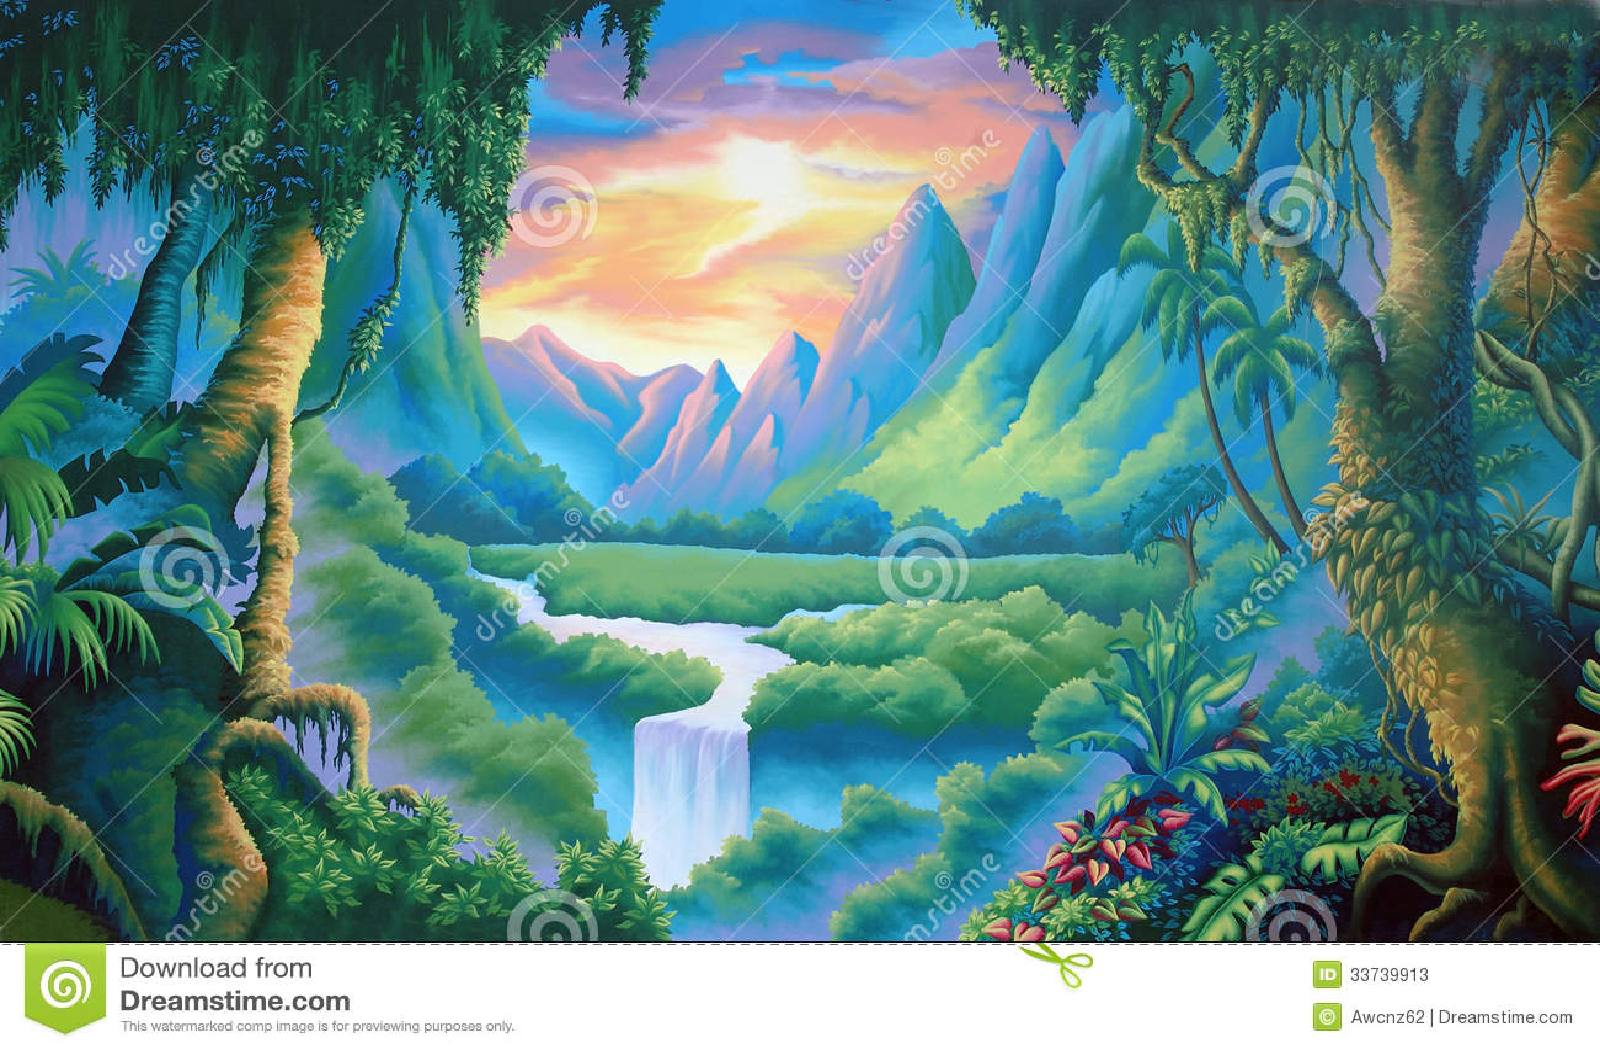 Jungle backdrop stock illustration Illustration of serenity